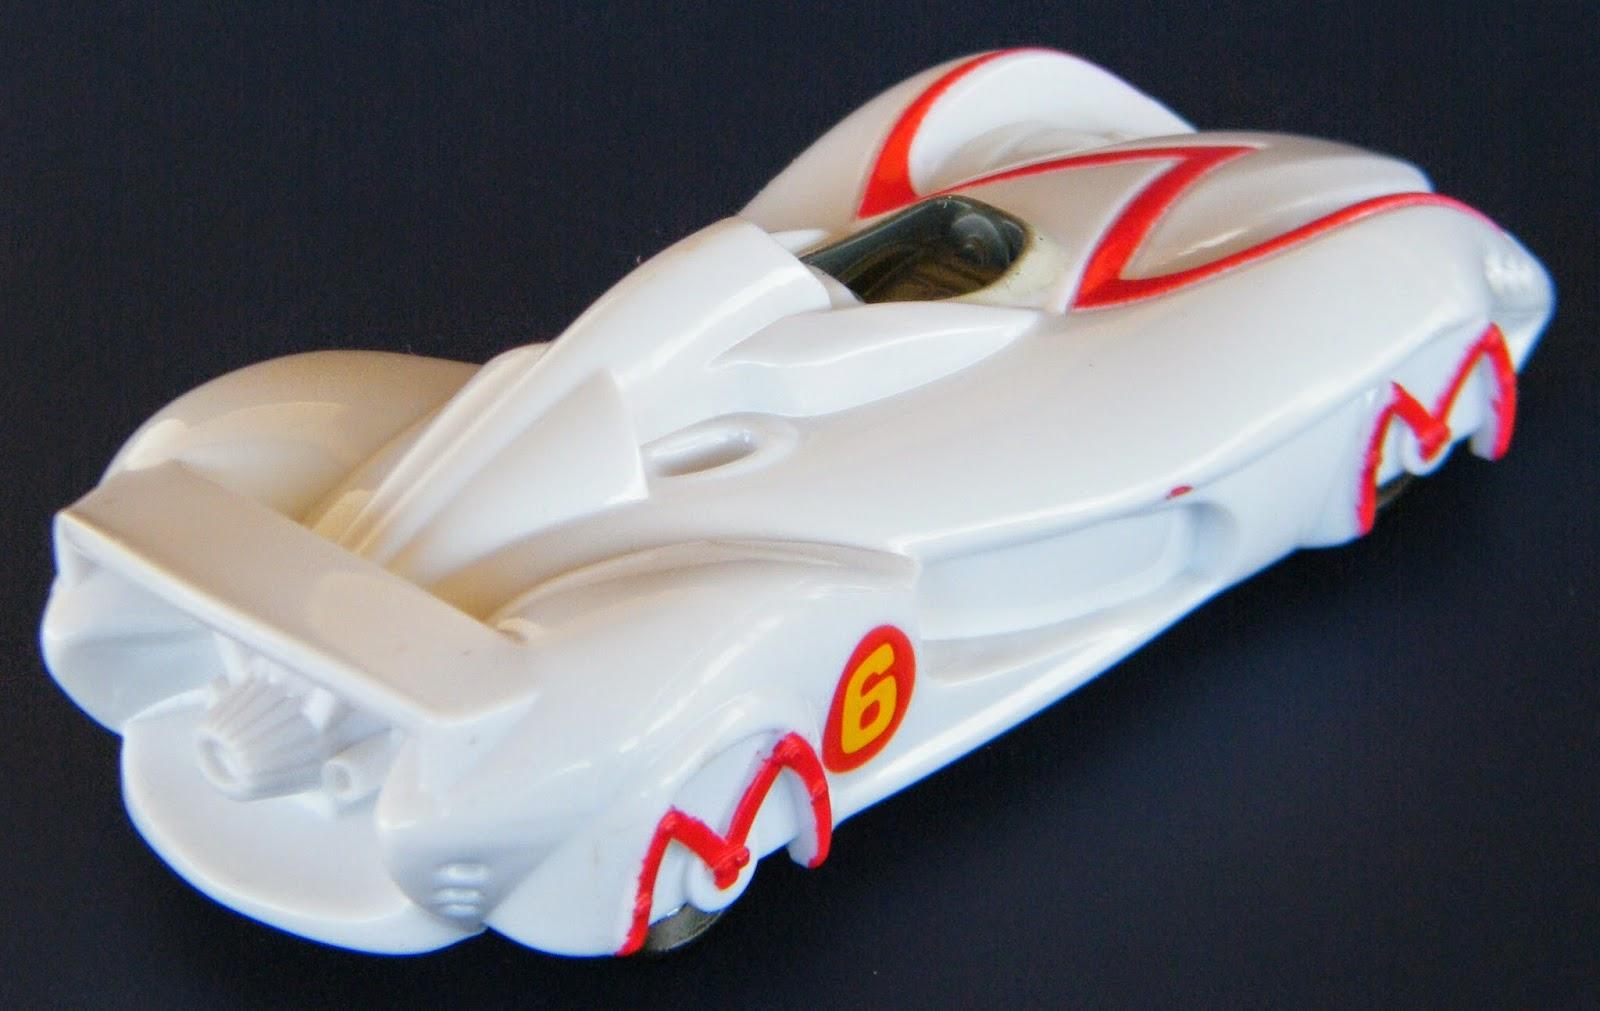 ... McDonald's 2008 'Speed Racer' Movie Cars - No. 3 Speed Racer's Mach 6